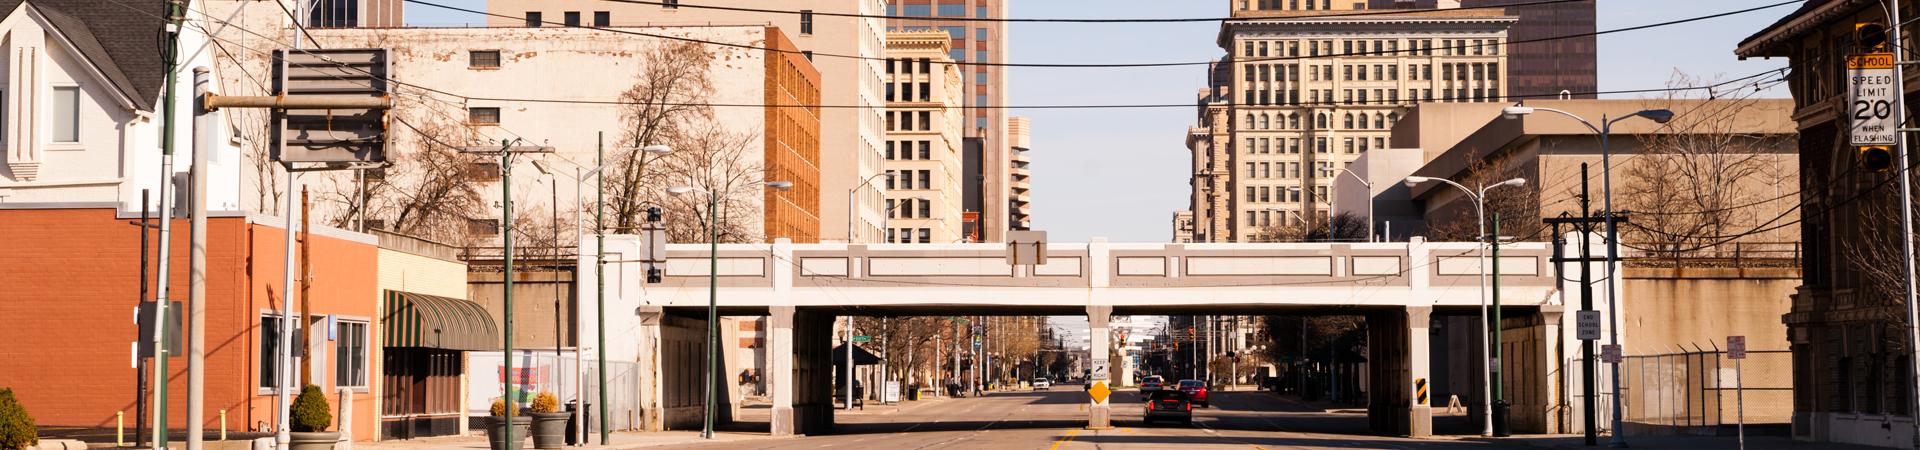 City street in Dayton, OH